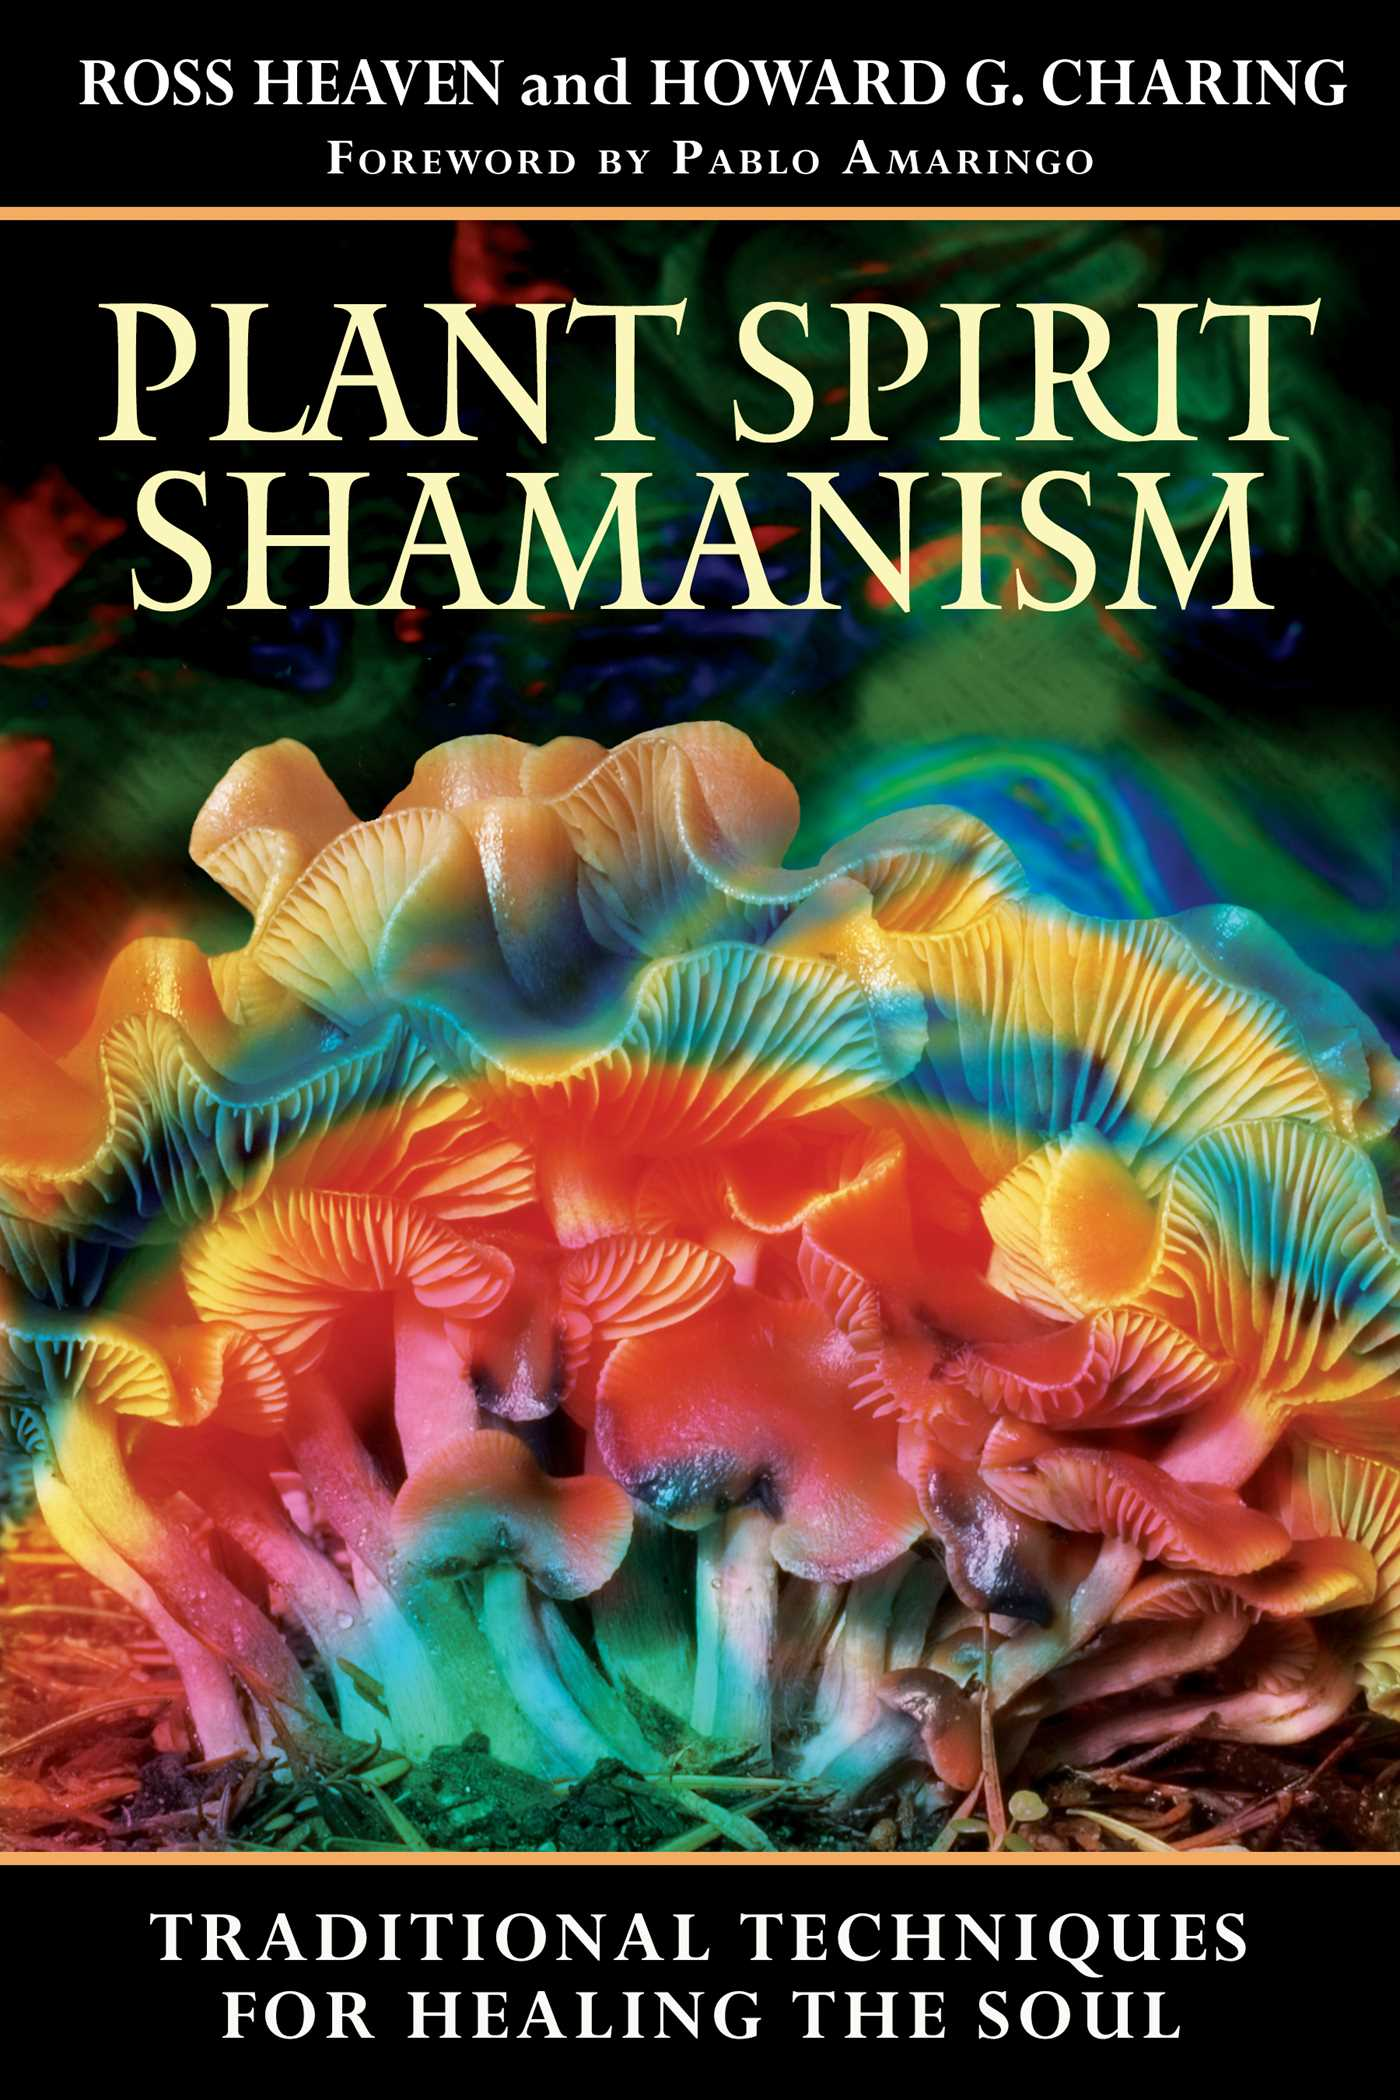 Plant spirit shamanism 9781594776663 hr